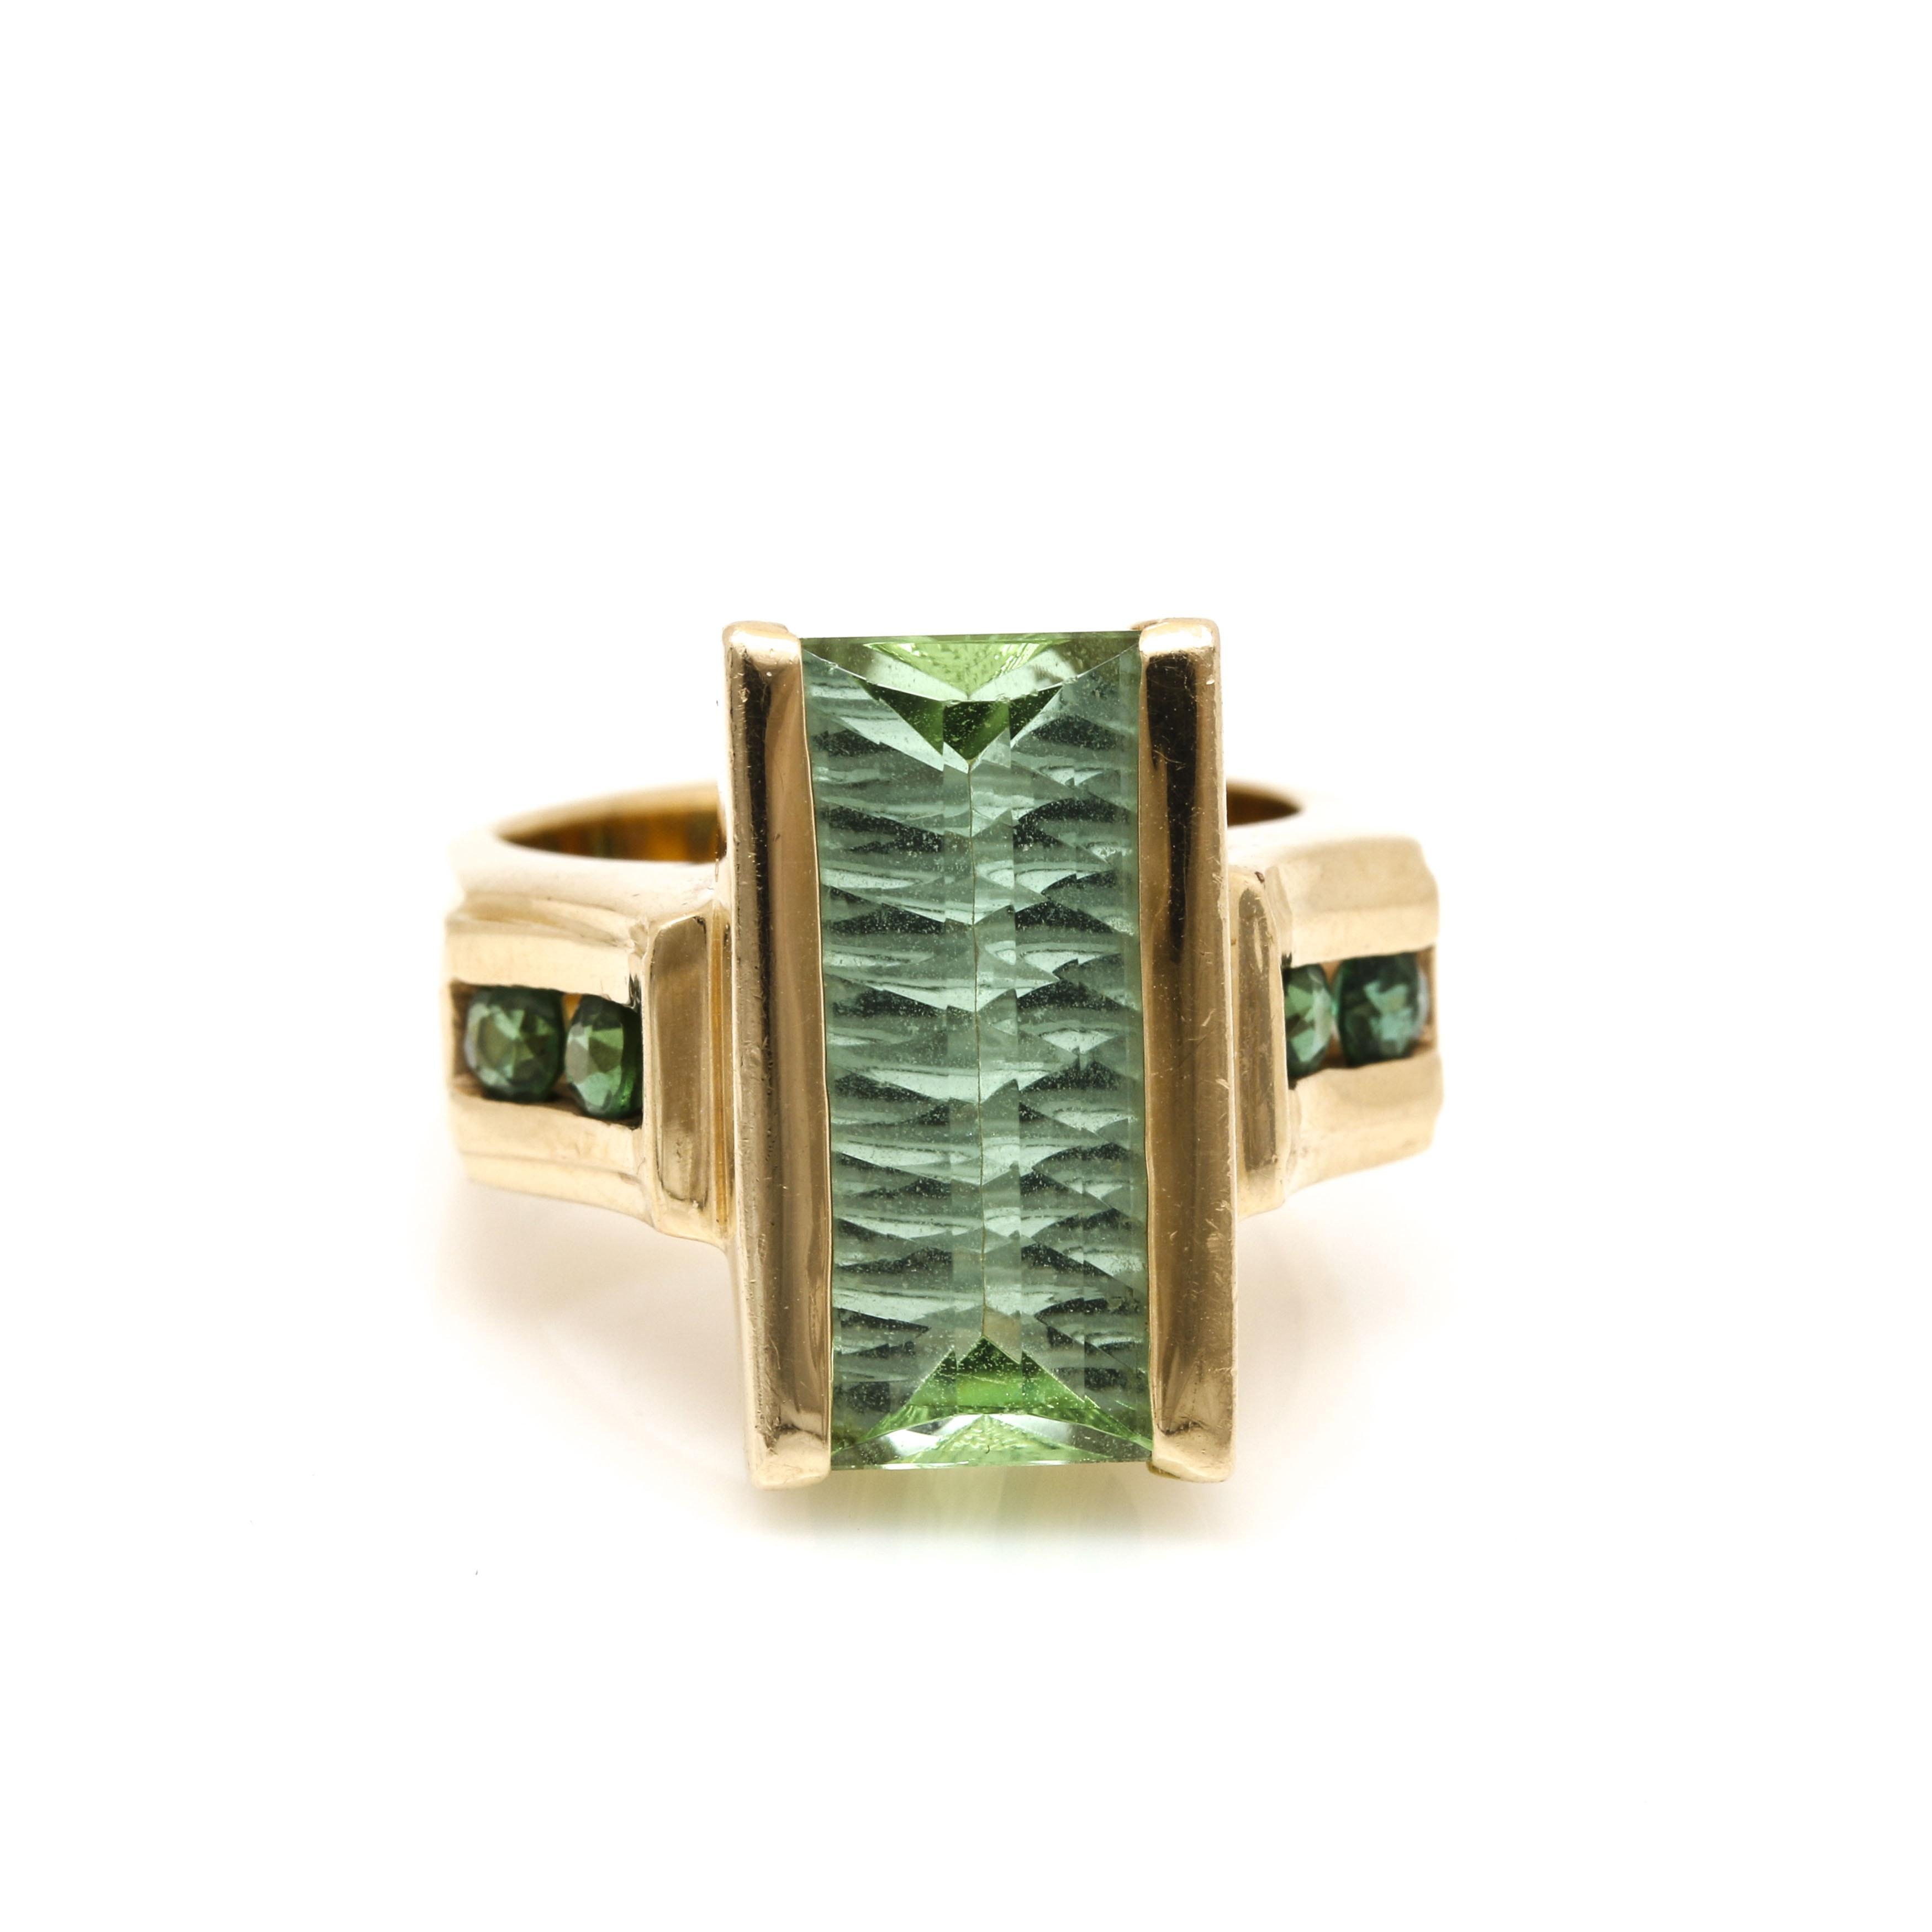 14K Yellow Gold 5.37 Carat Rectangle Facet Cut Green Tourmaline Ring